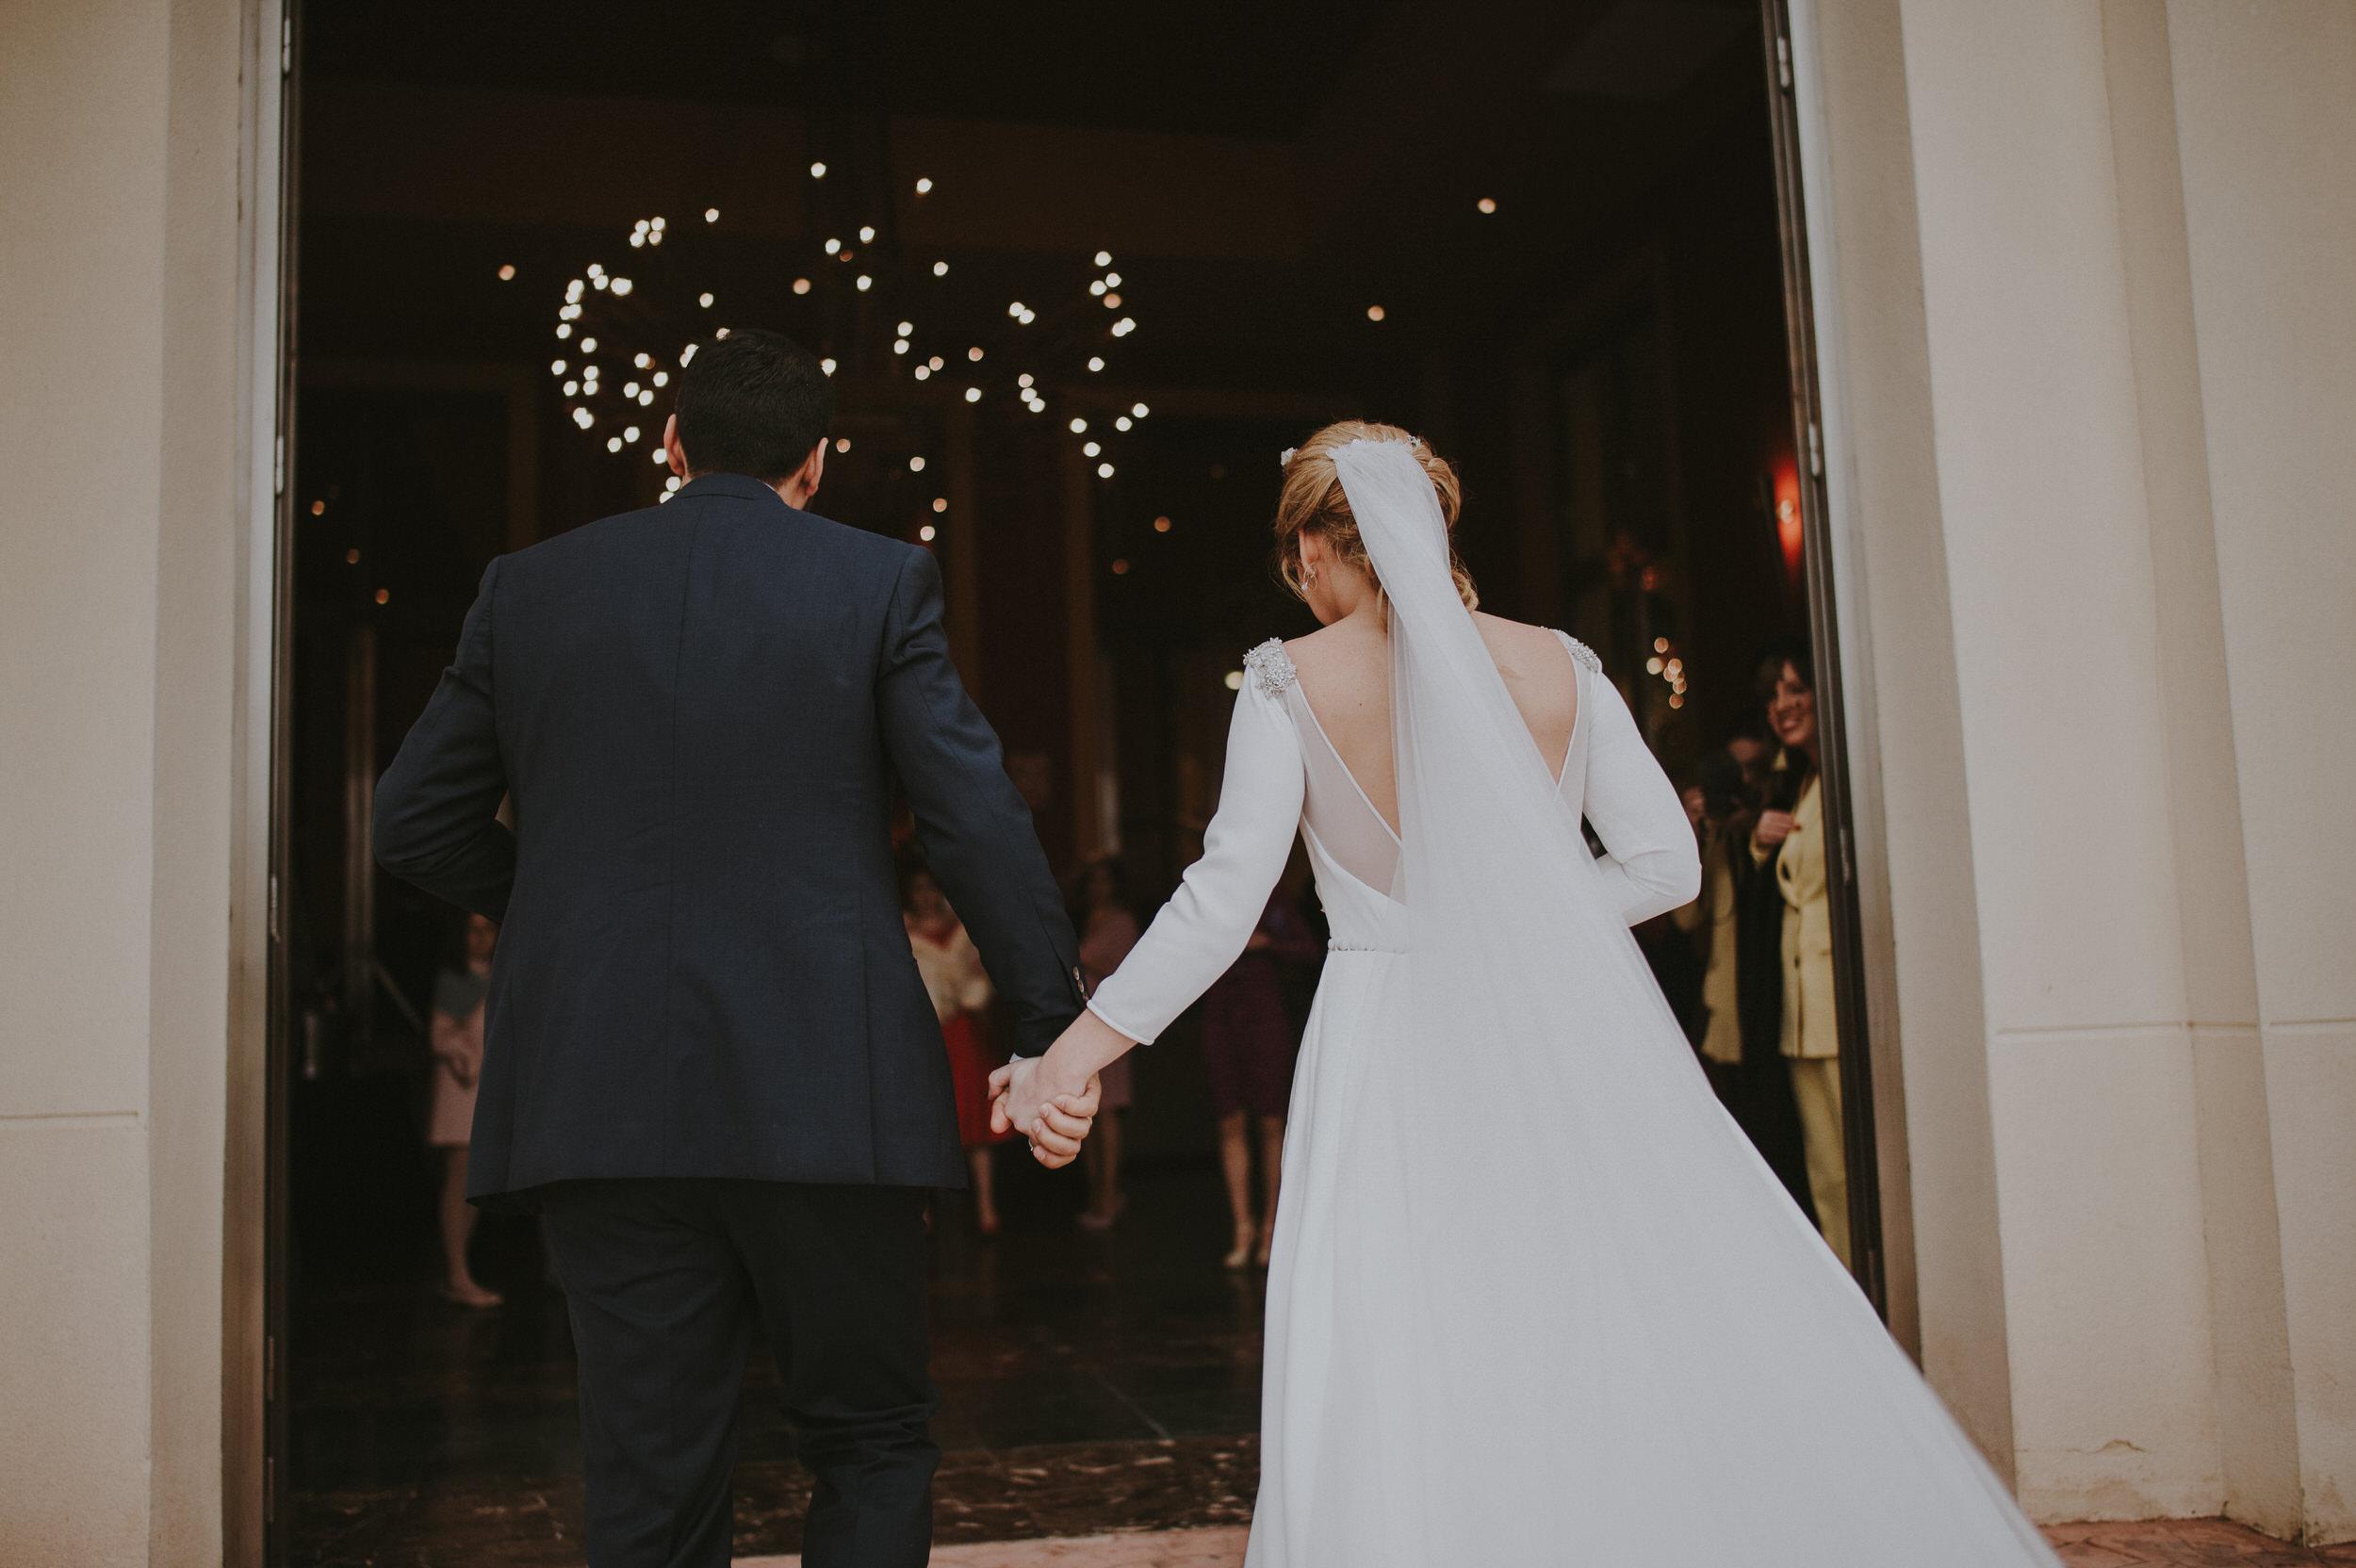 Cristina & Jero - Boda en Ecija - Iglesia Santa Ana - Fotógrafo Andrés Amarillo (46).JPG